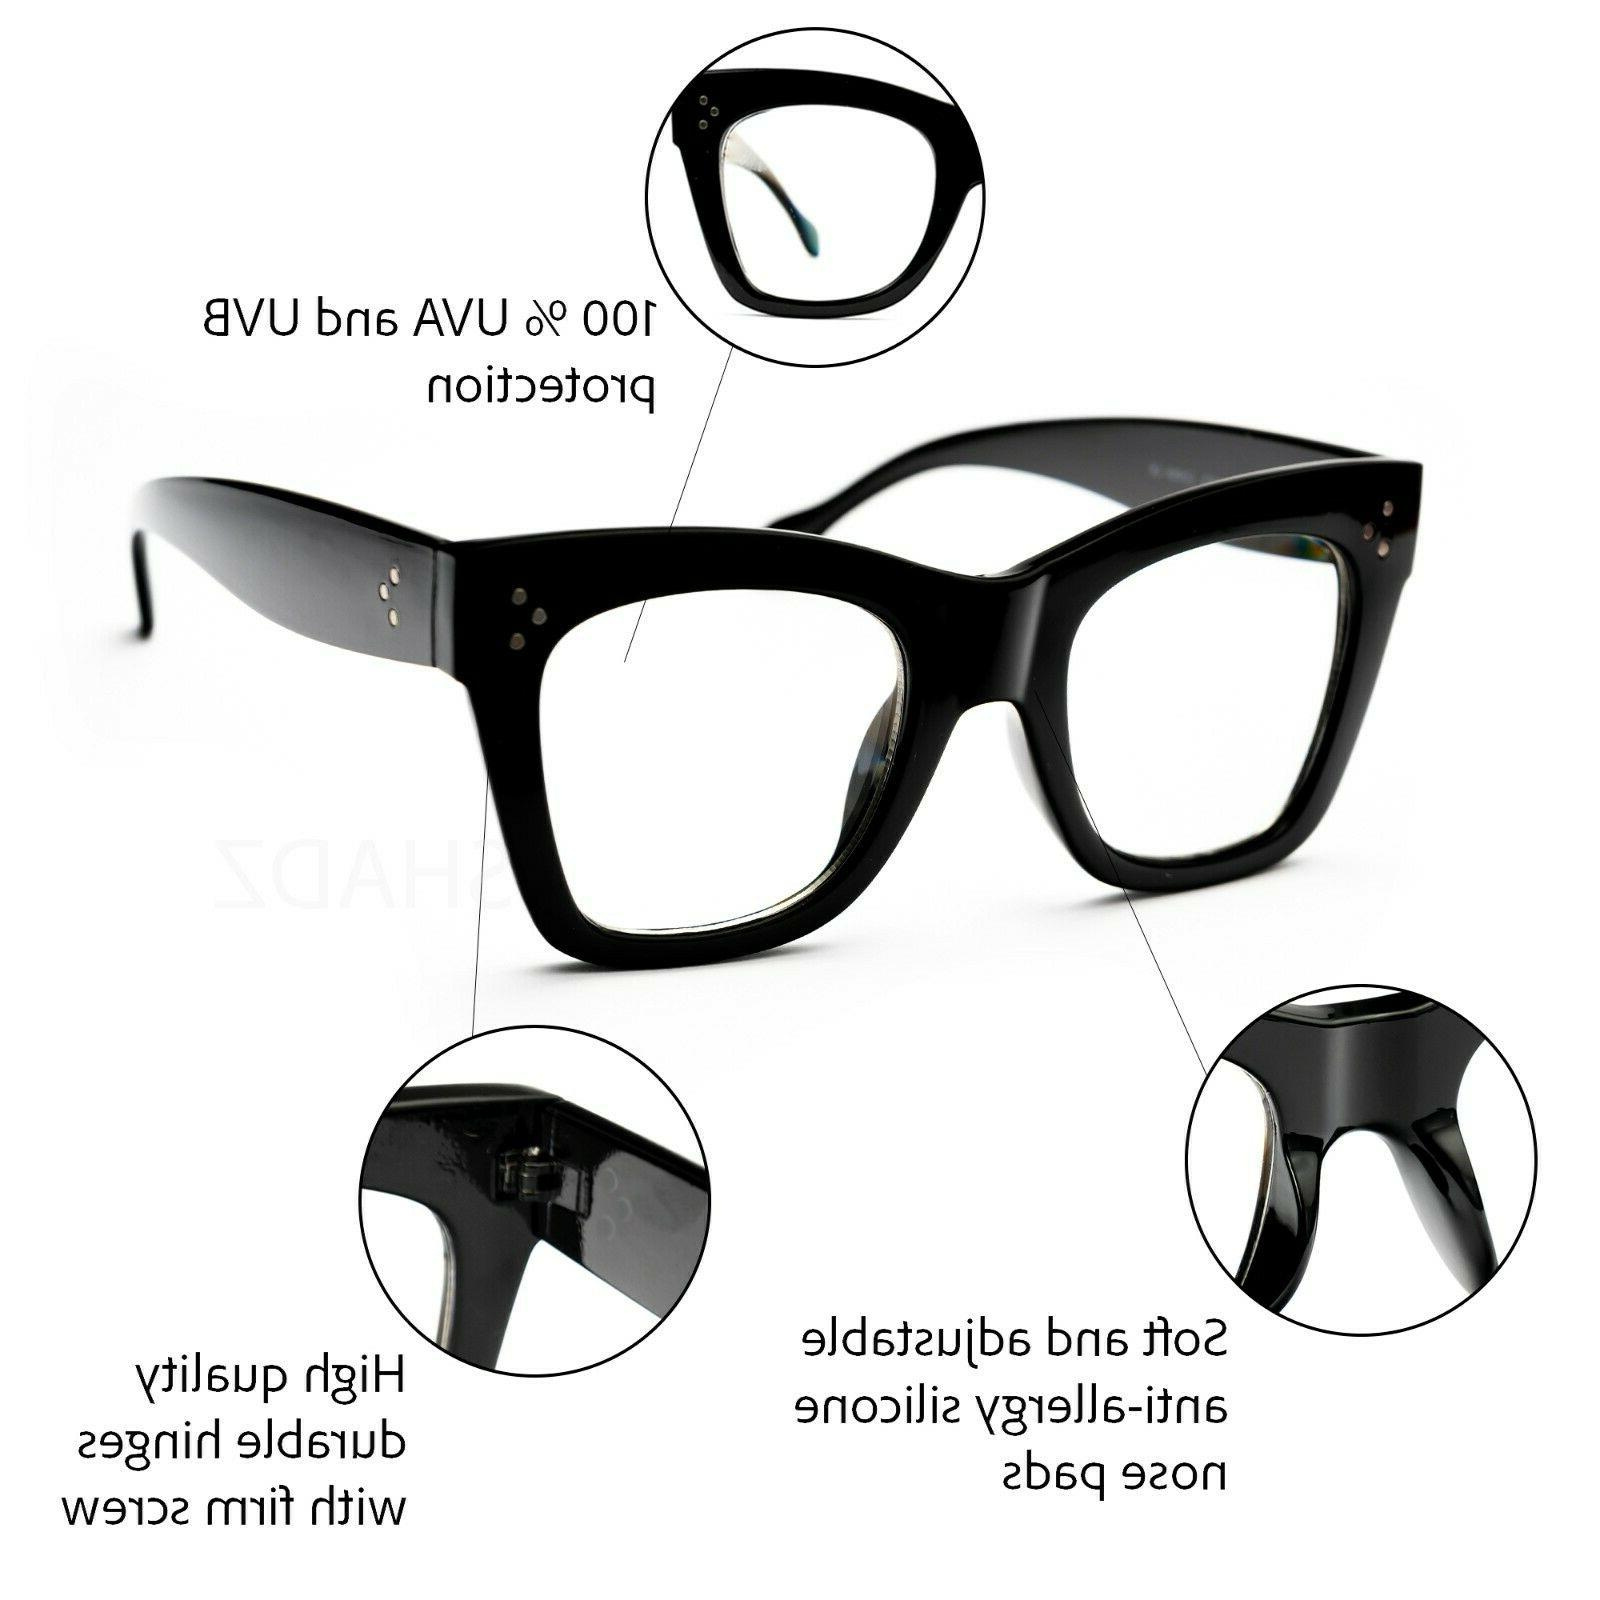 Oversized thick Women Eyeglasses Shadz NERD